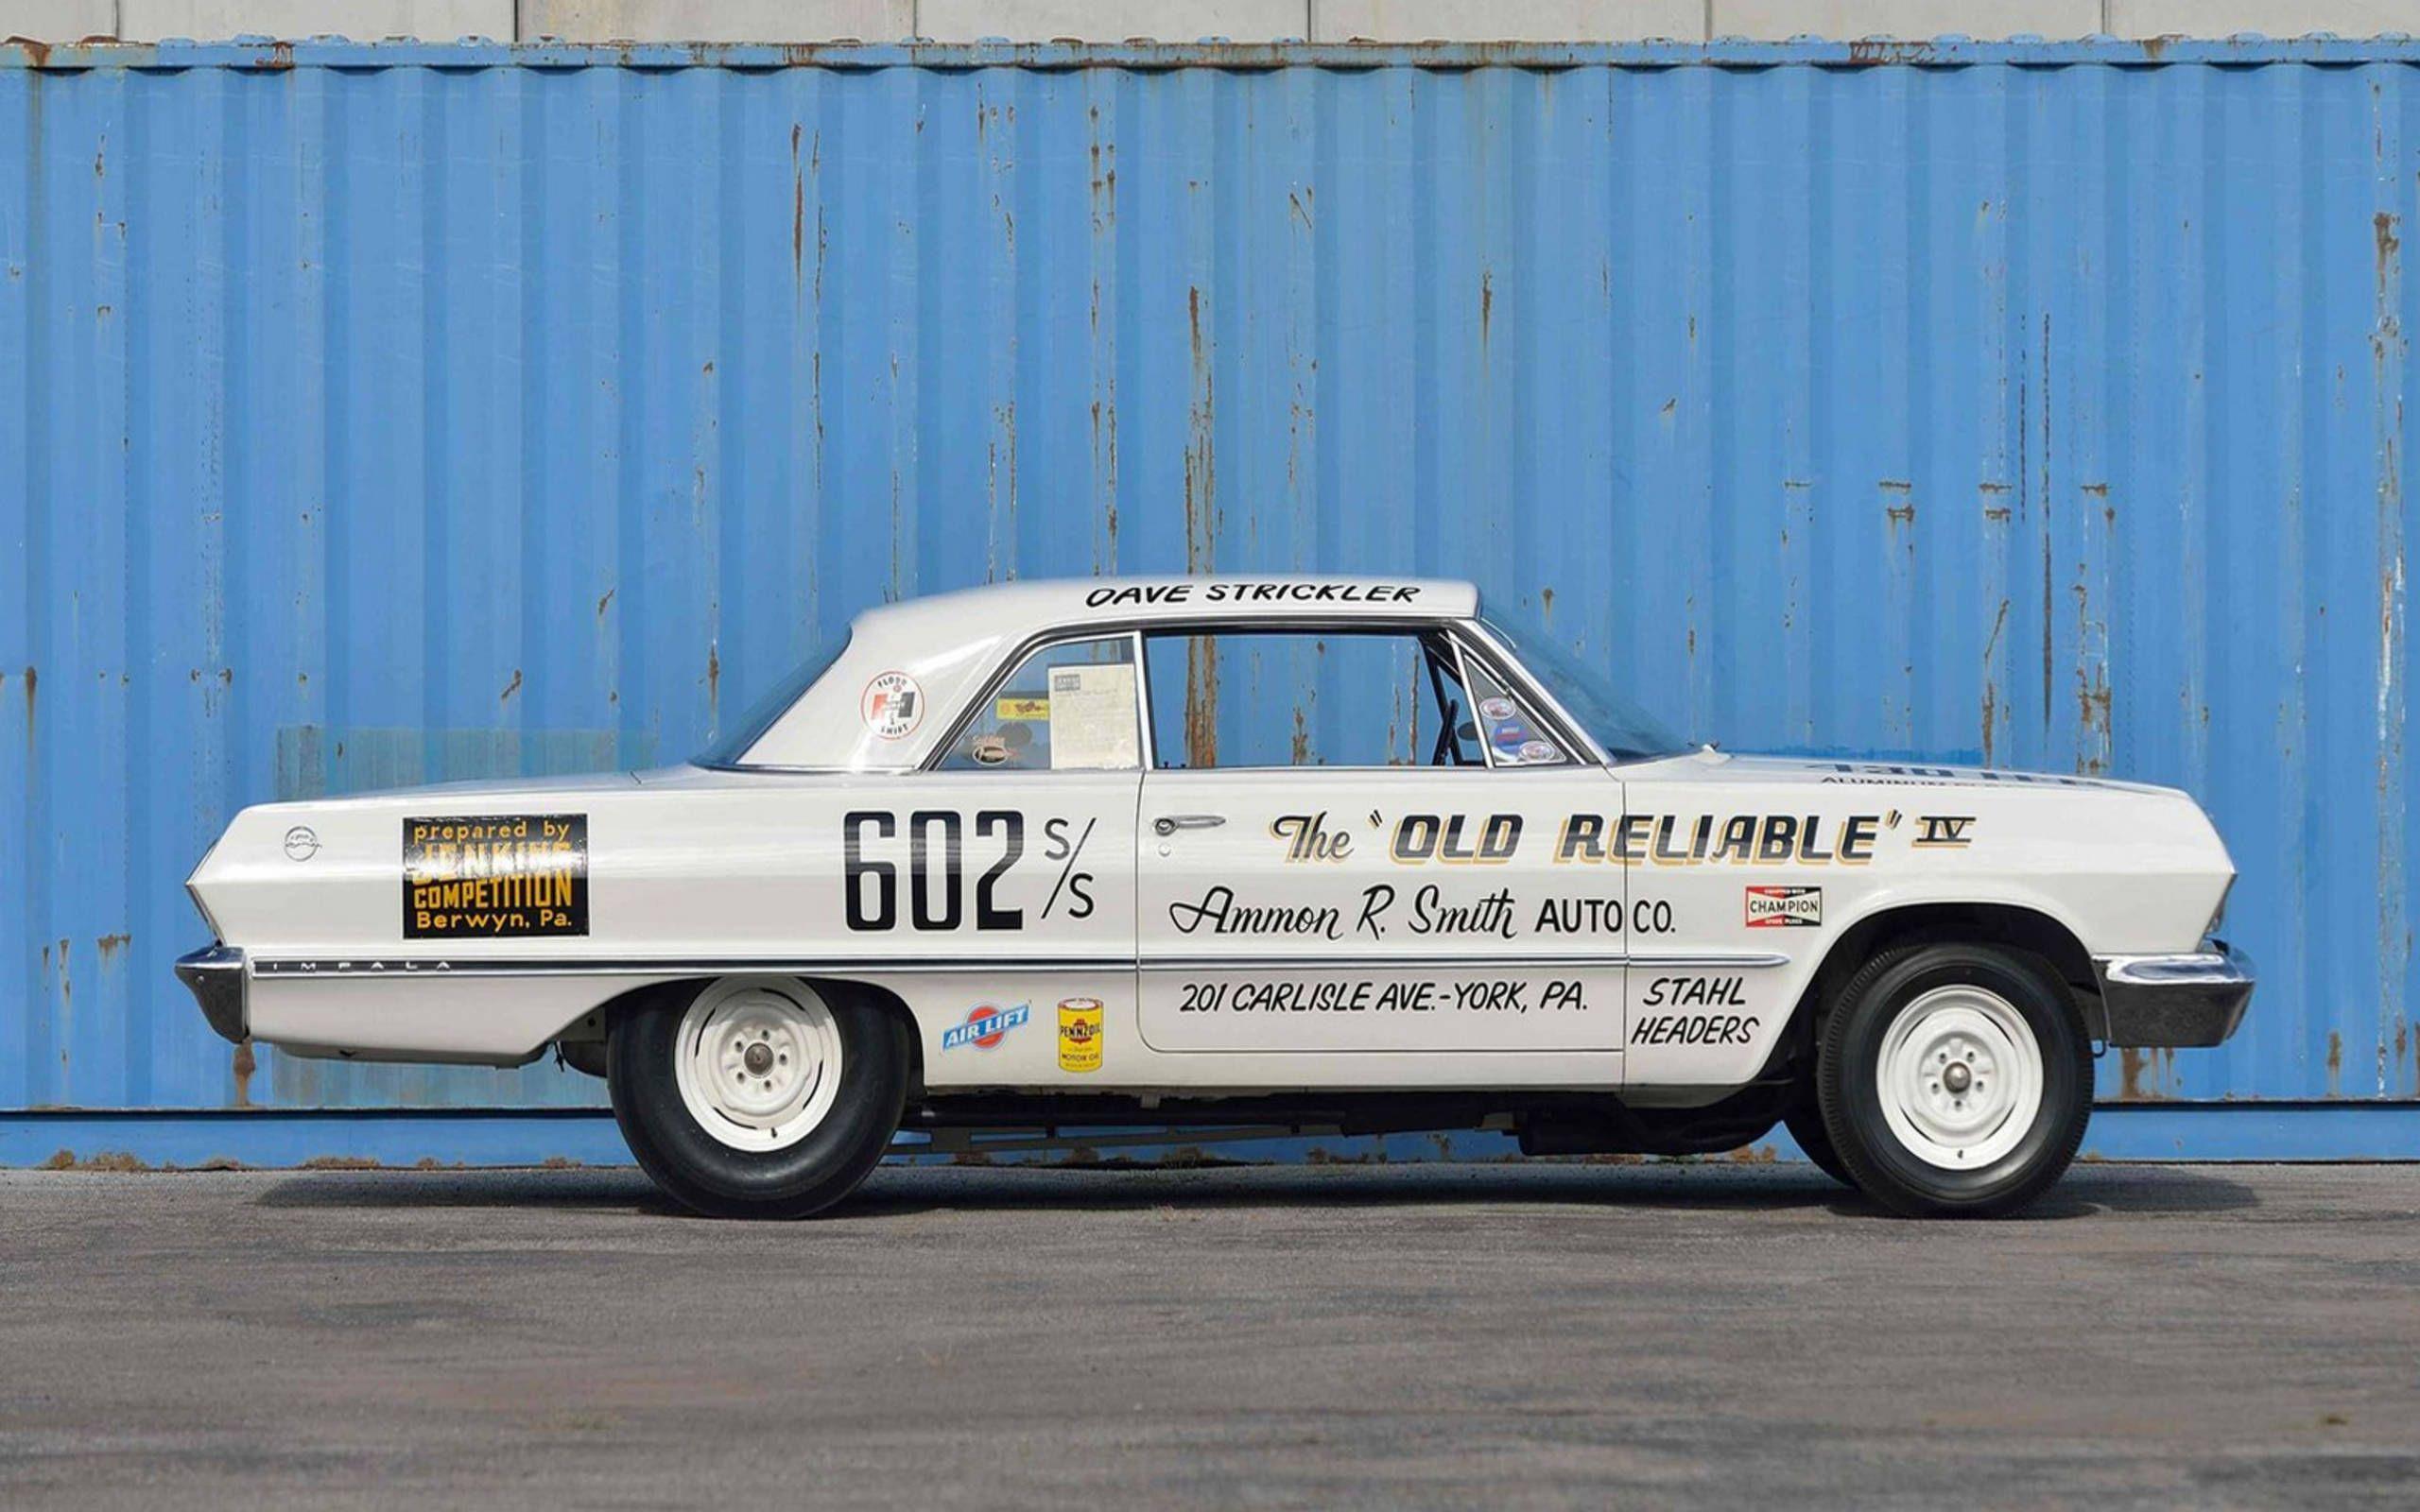 The 1963 Chevrolet Impala Z11 Lightweight